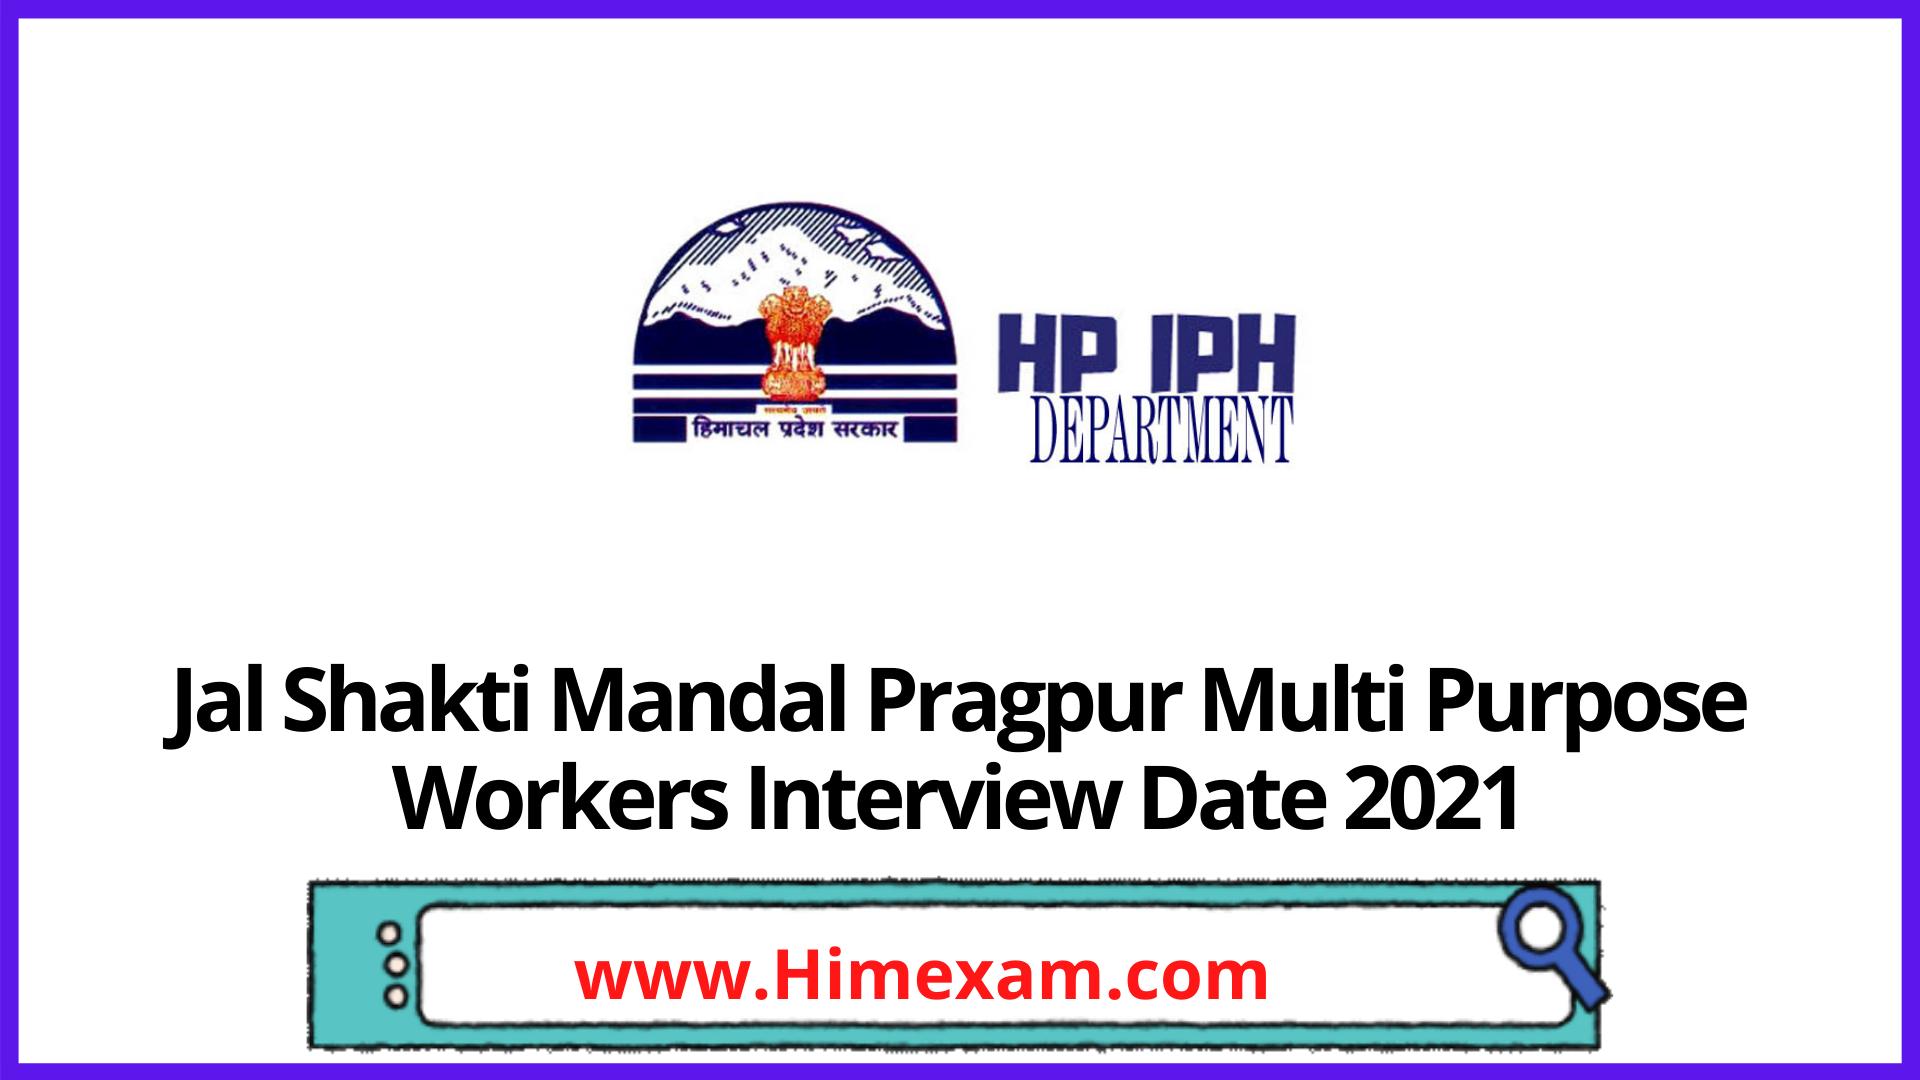 Jal Shakti Mandal Pragpur Multi Purpose Workers Interview Date 2021